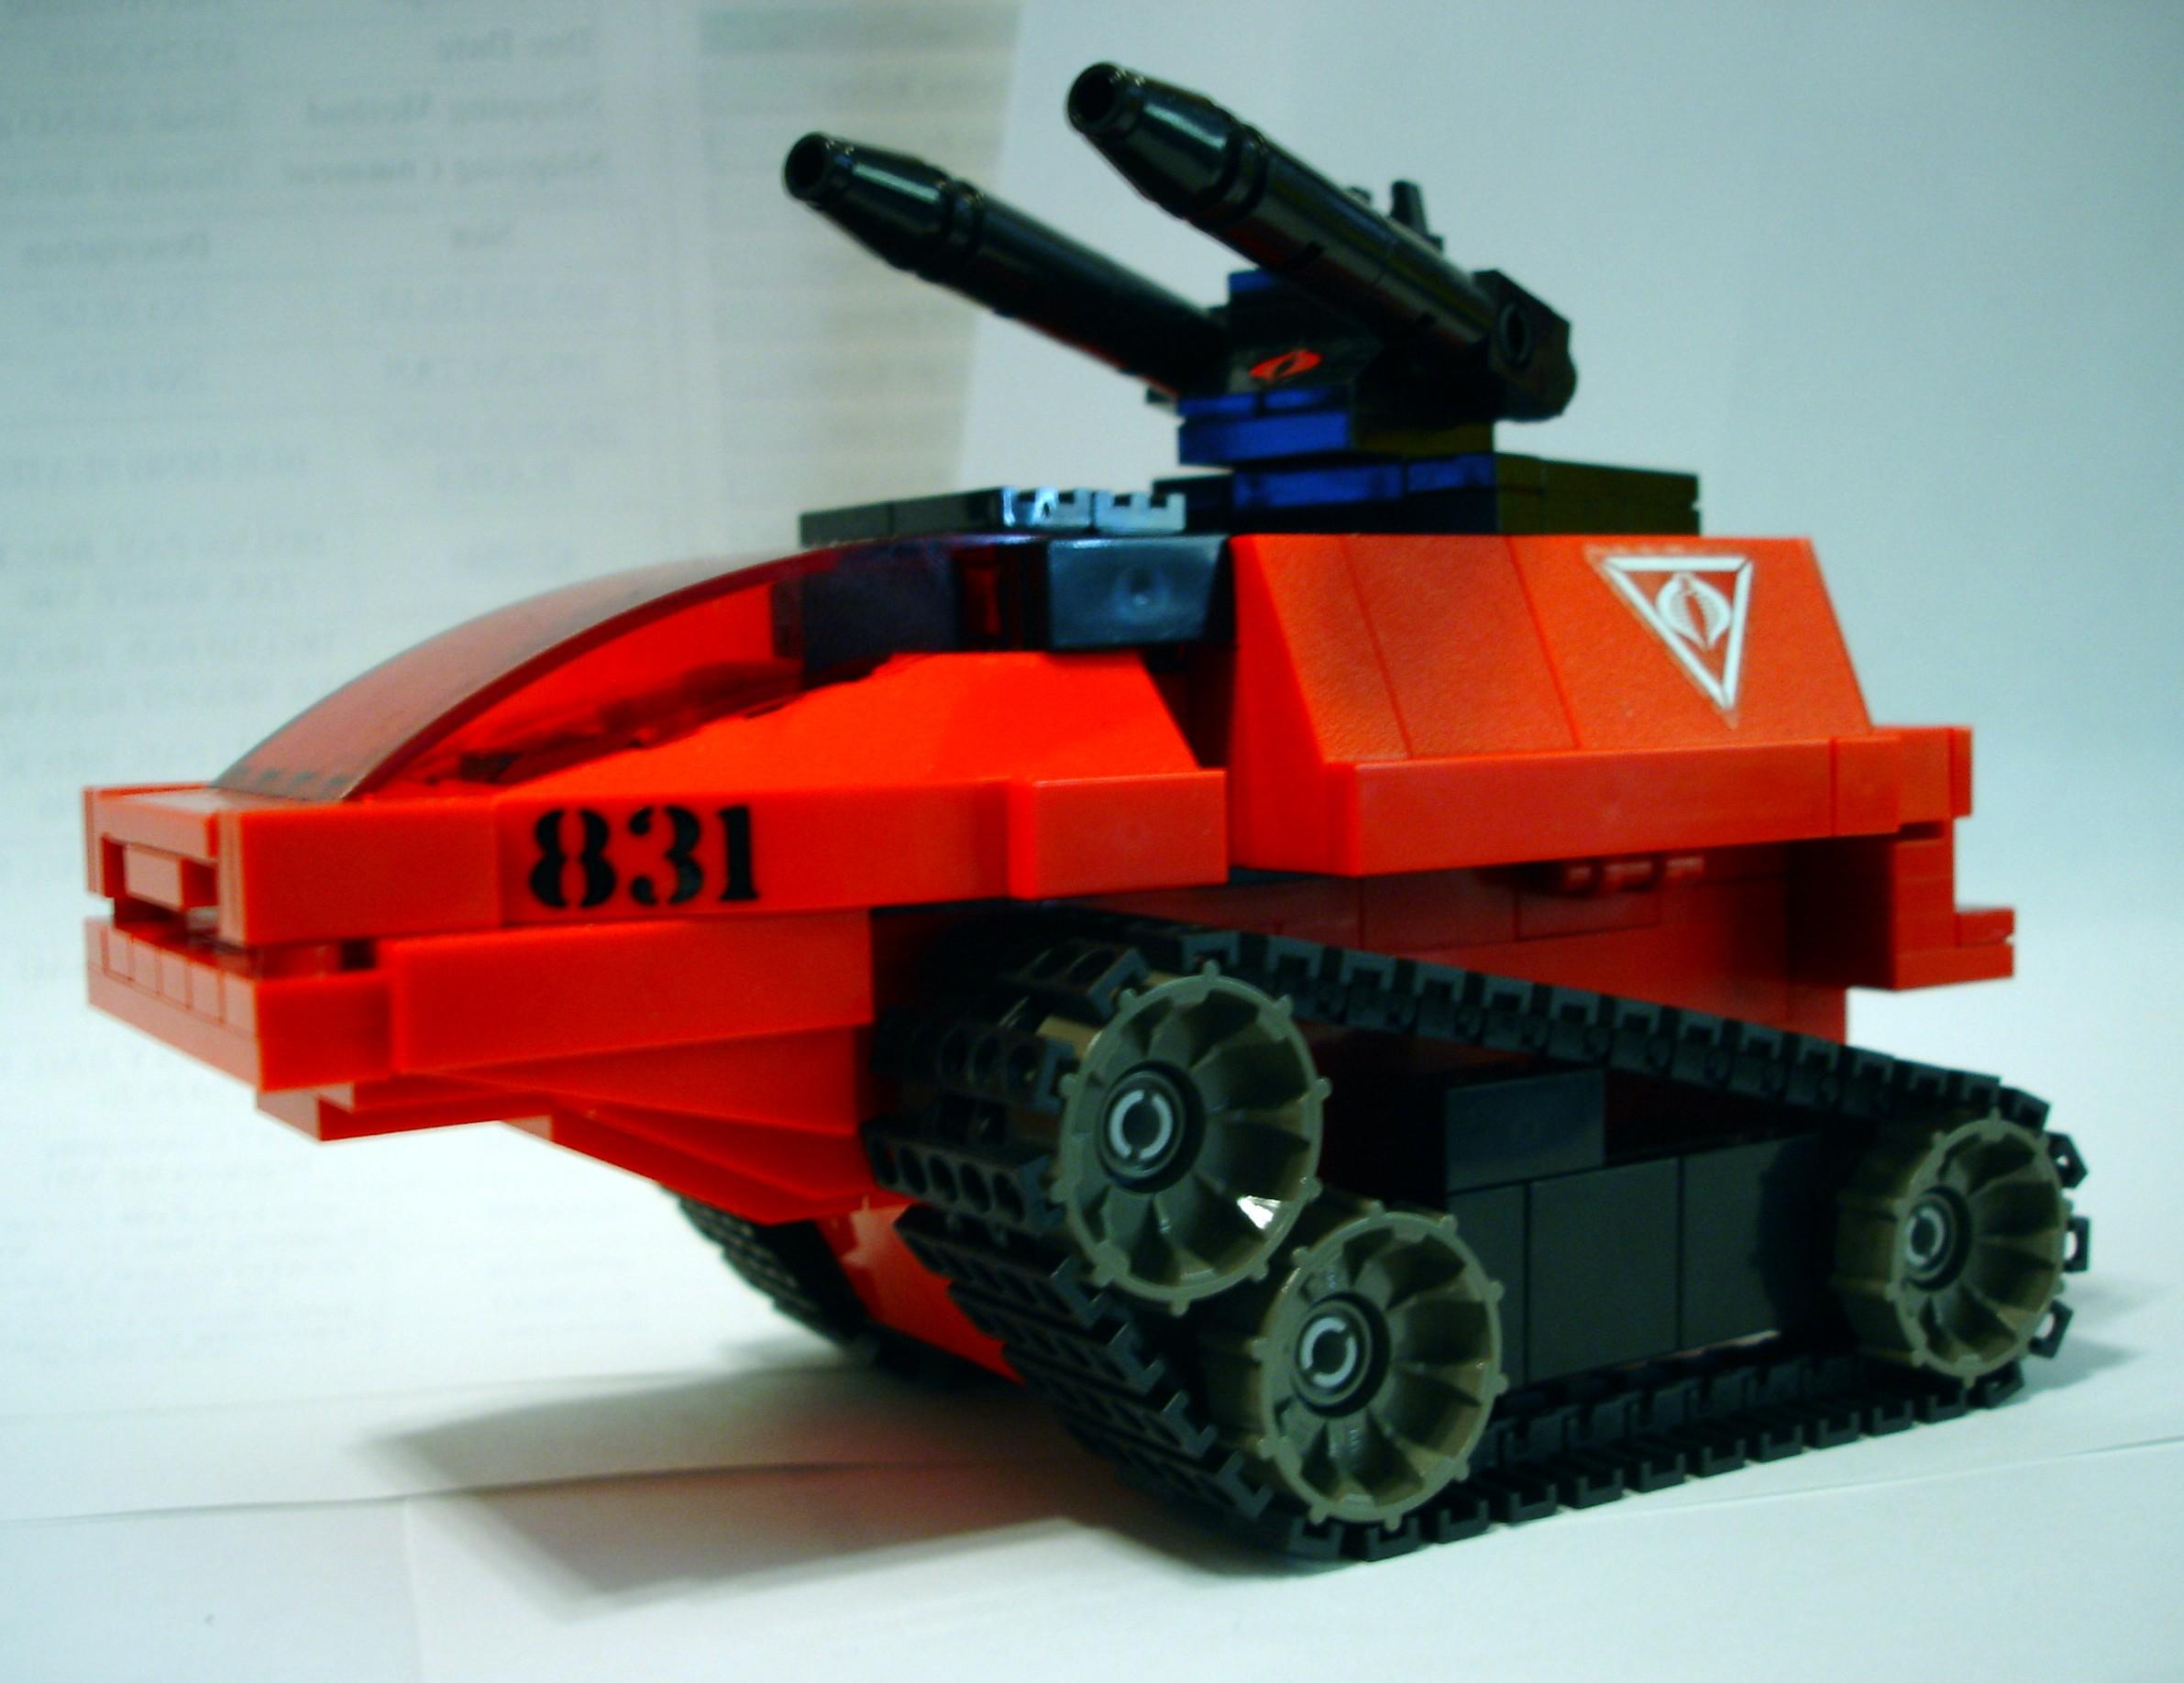 Lego Like Toys : Hasbro lego like toys in hisstank